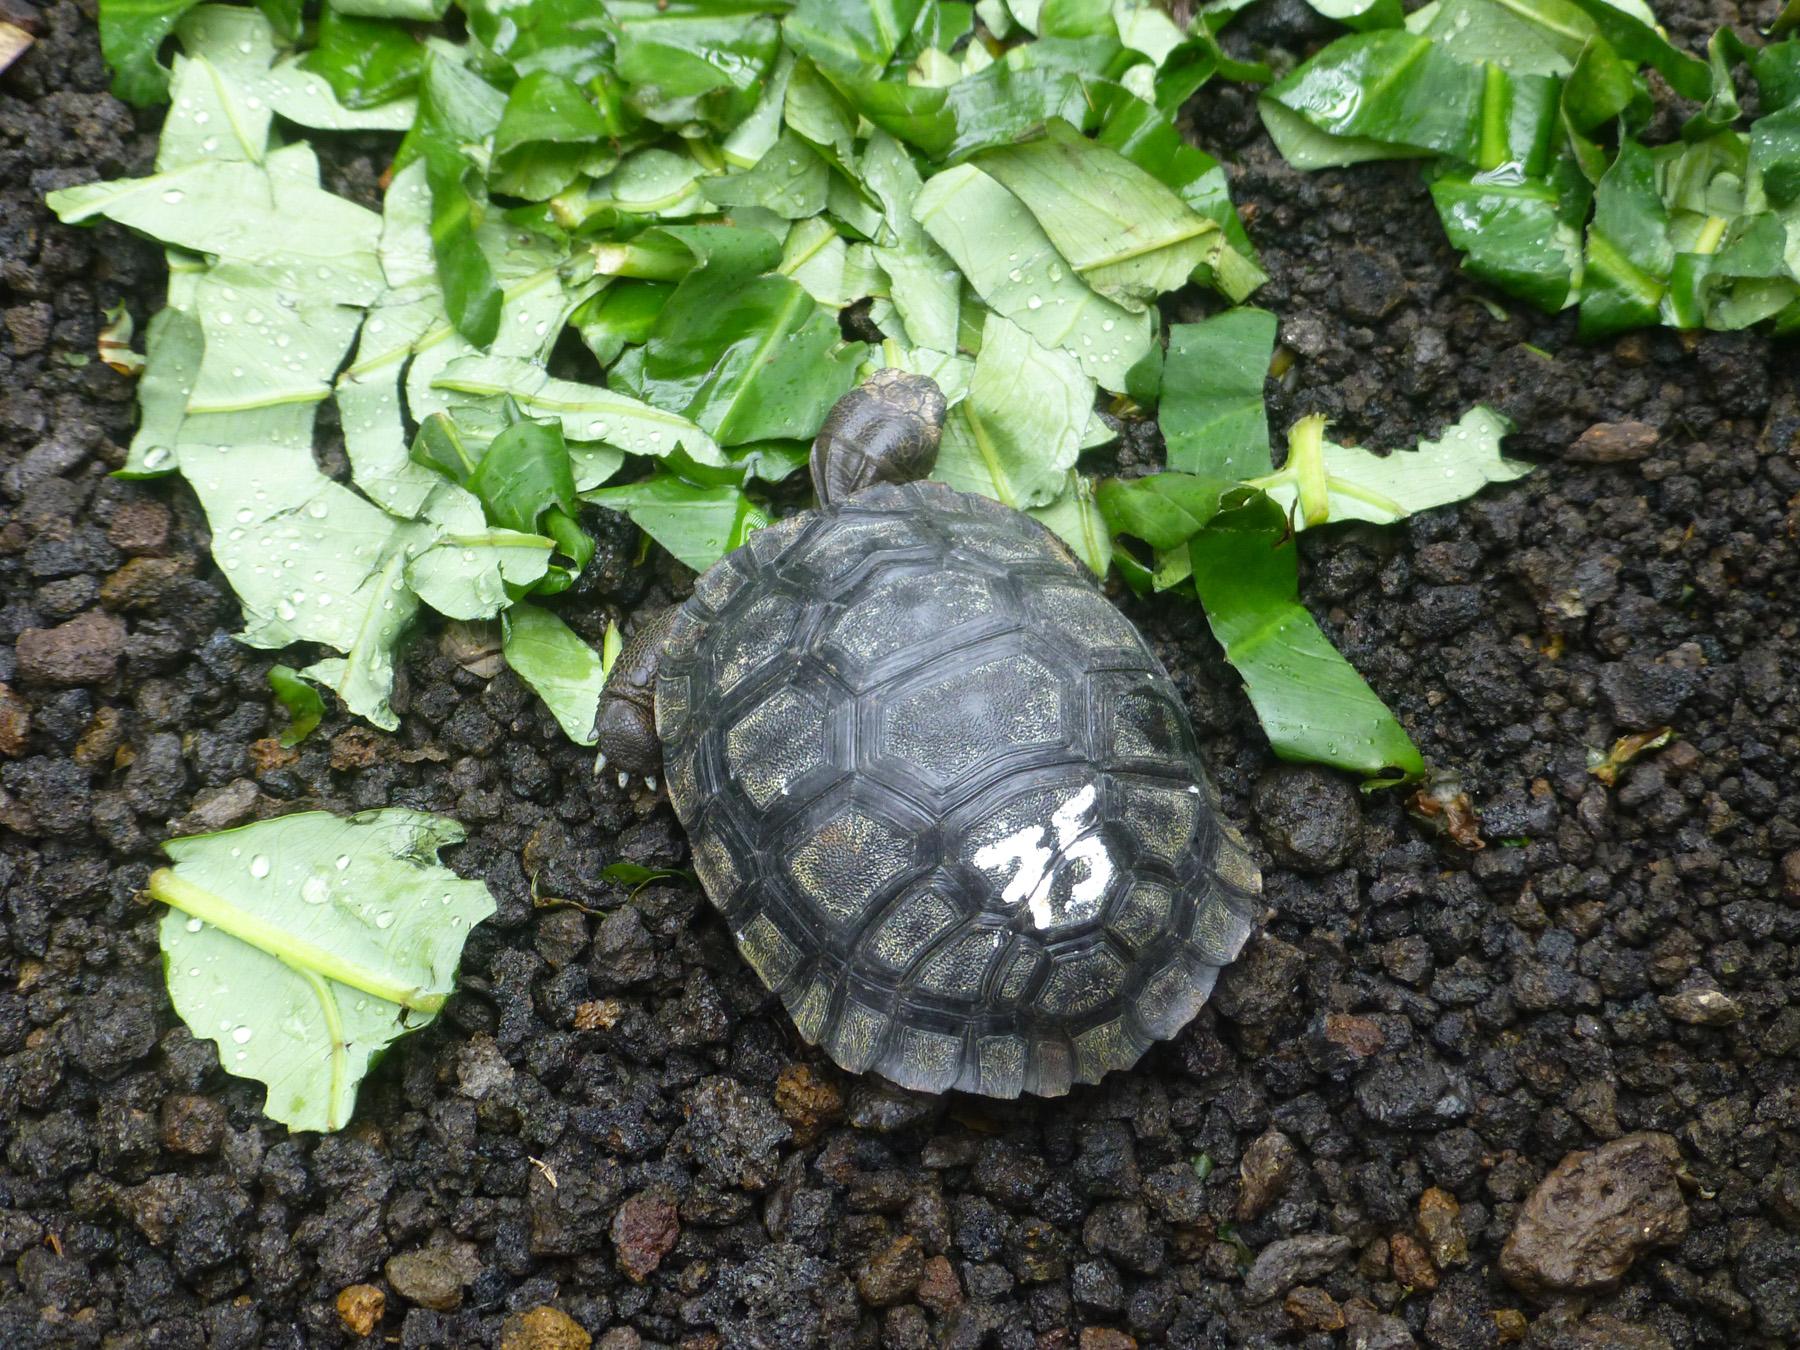 Baby Giant Tortoise!